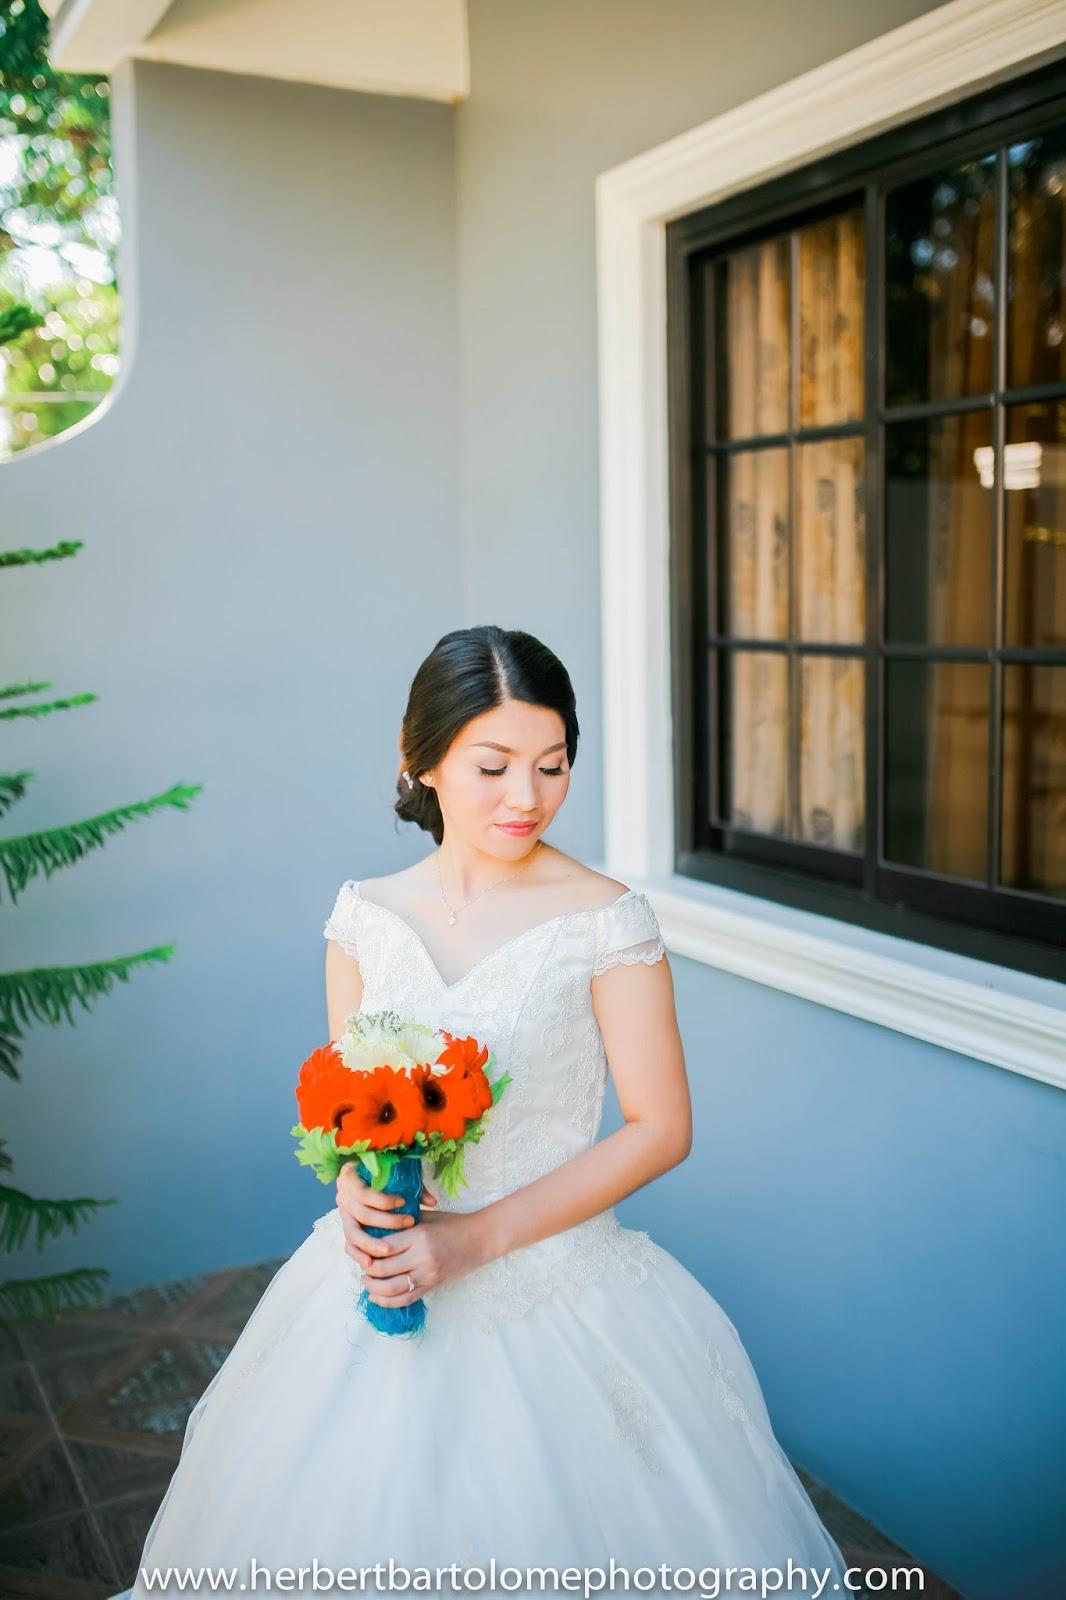 Herbert Bartolome Photography: Mark Anthony & Mary Rose I Wedding